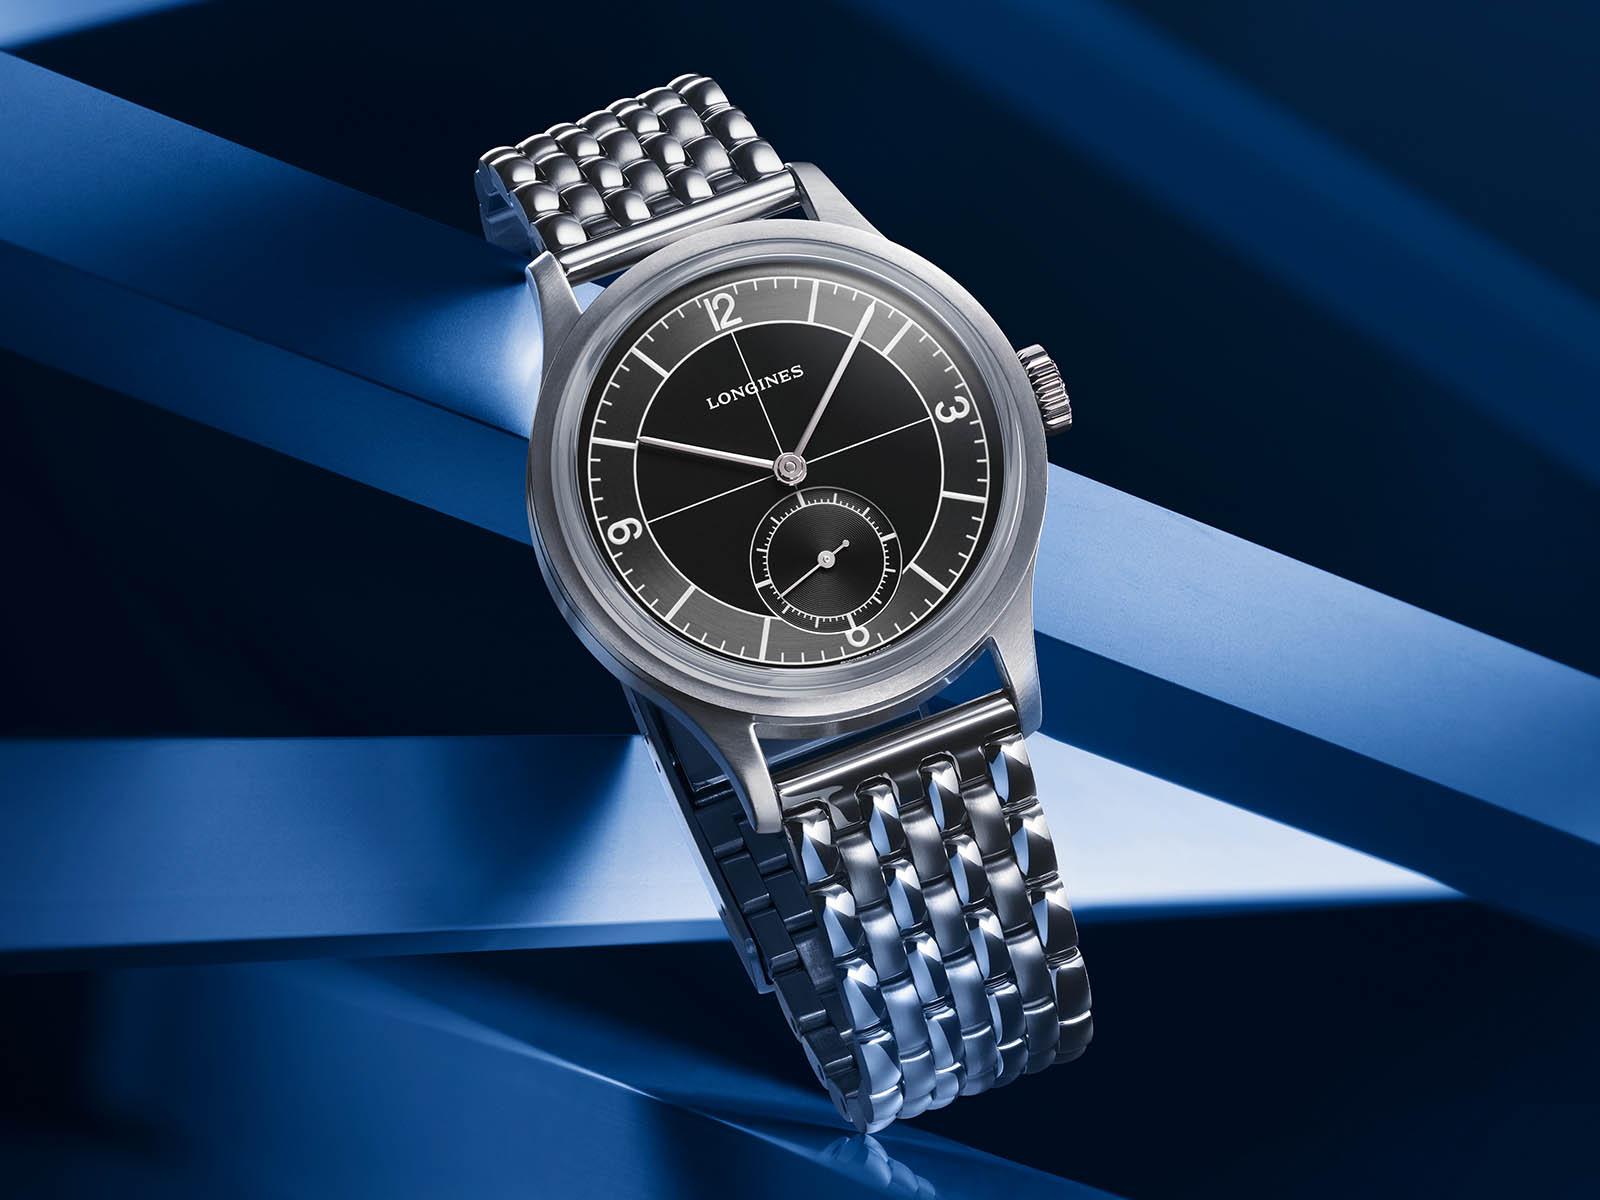 l2-828-4-53-6-longines-heritage-classic-black-dial-2.jpg